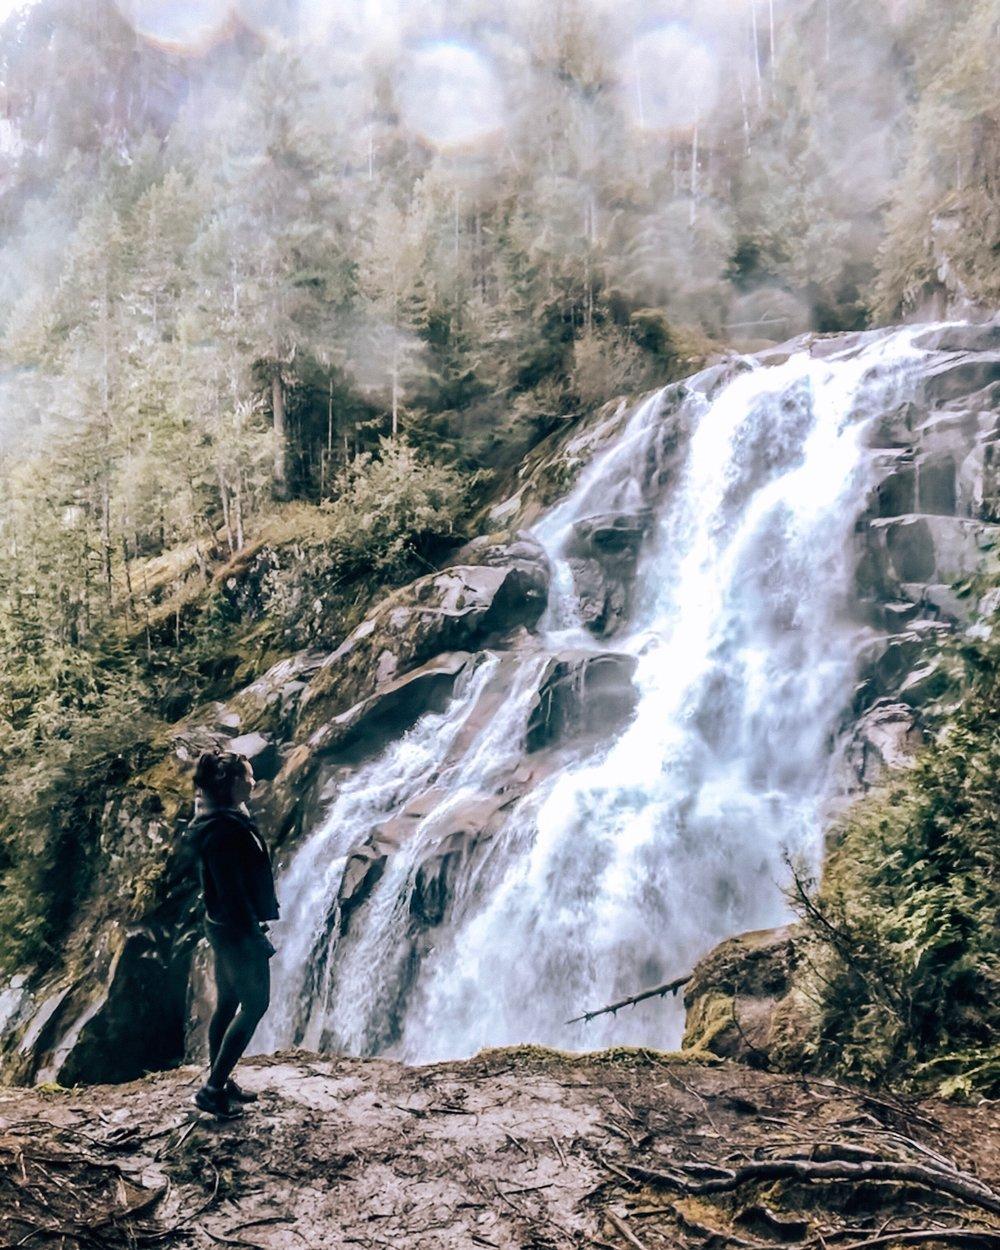 Crooked Falls Hike in Squamish British Columbia